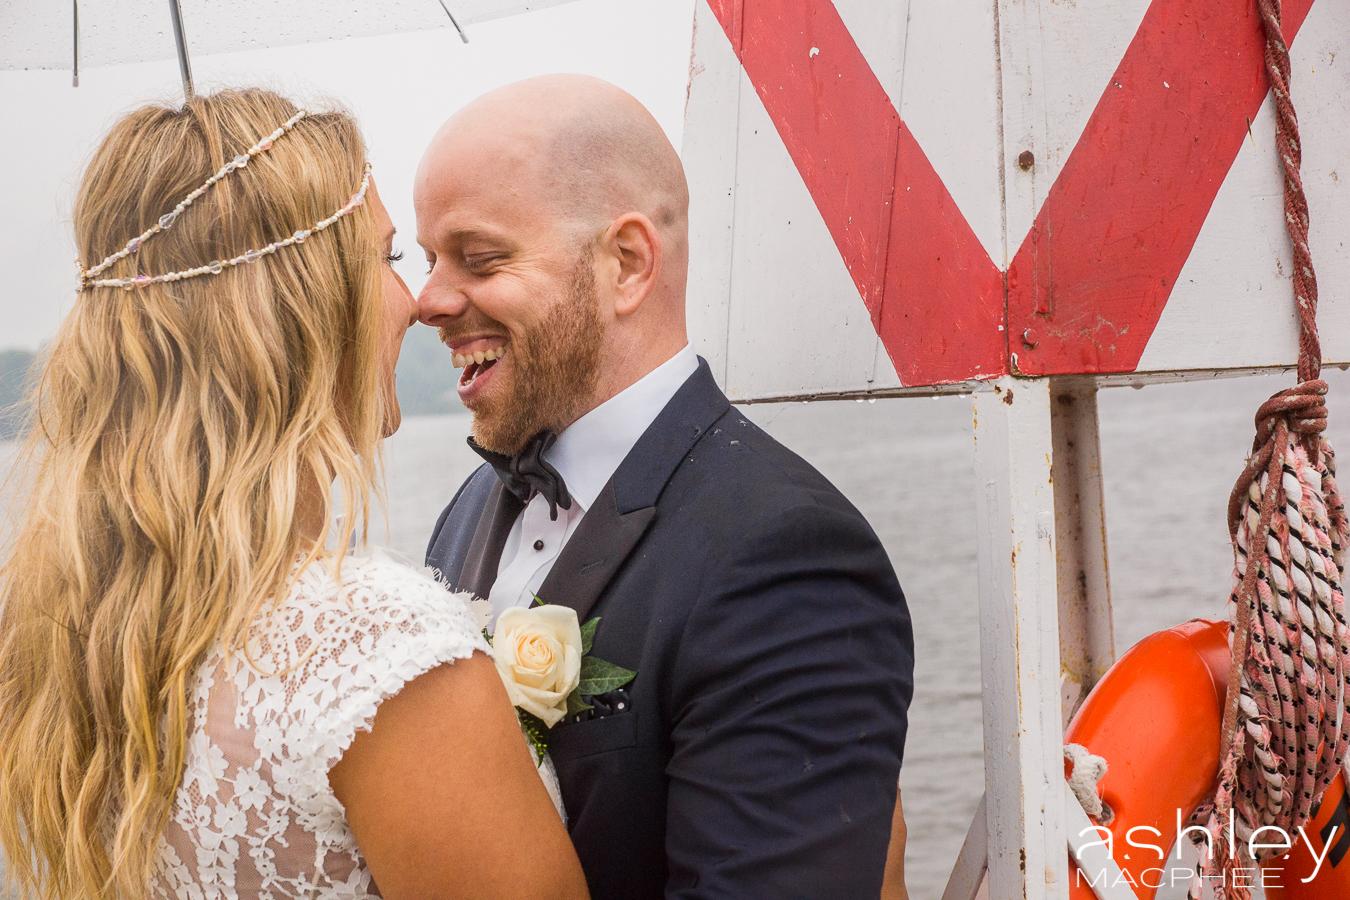 Ashley MacPhee Photography Hudson Yacht Club wedding photographer (71 of 112).jpg